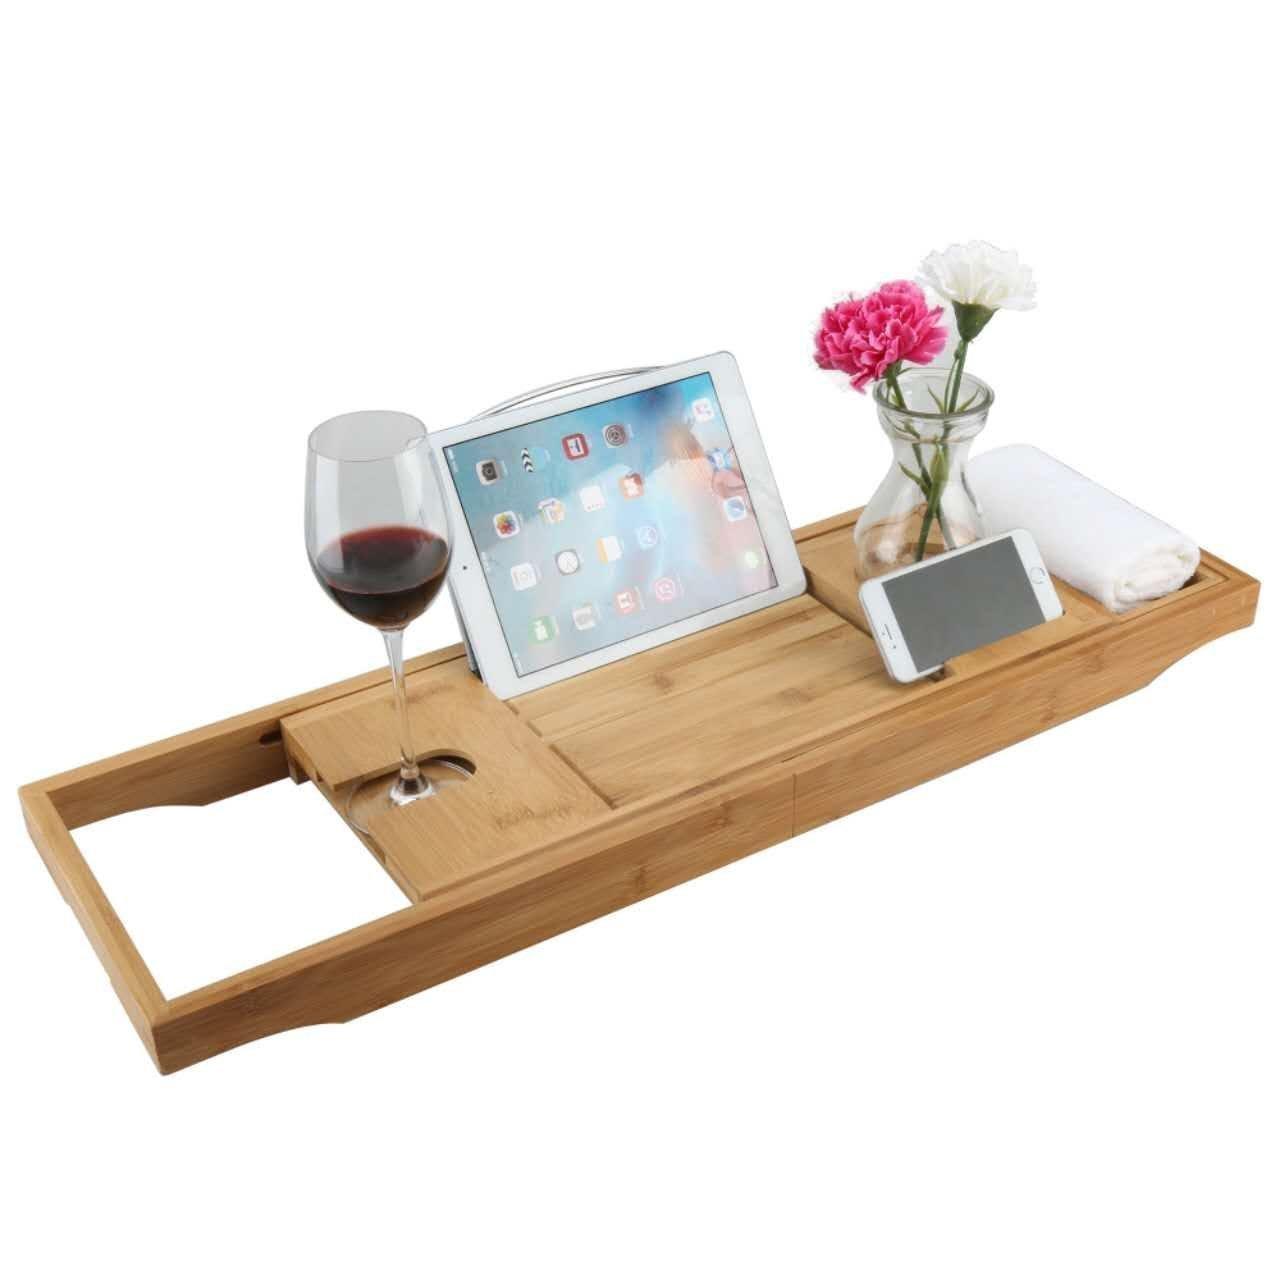 Best tray for bathtub | Amazon.com